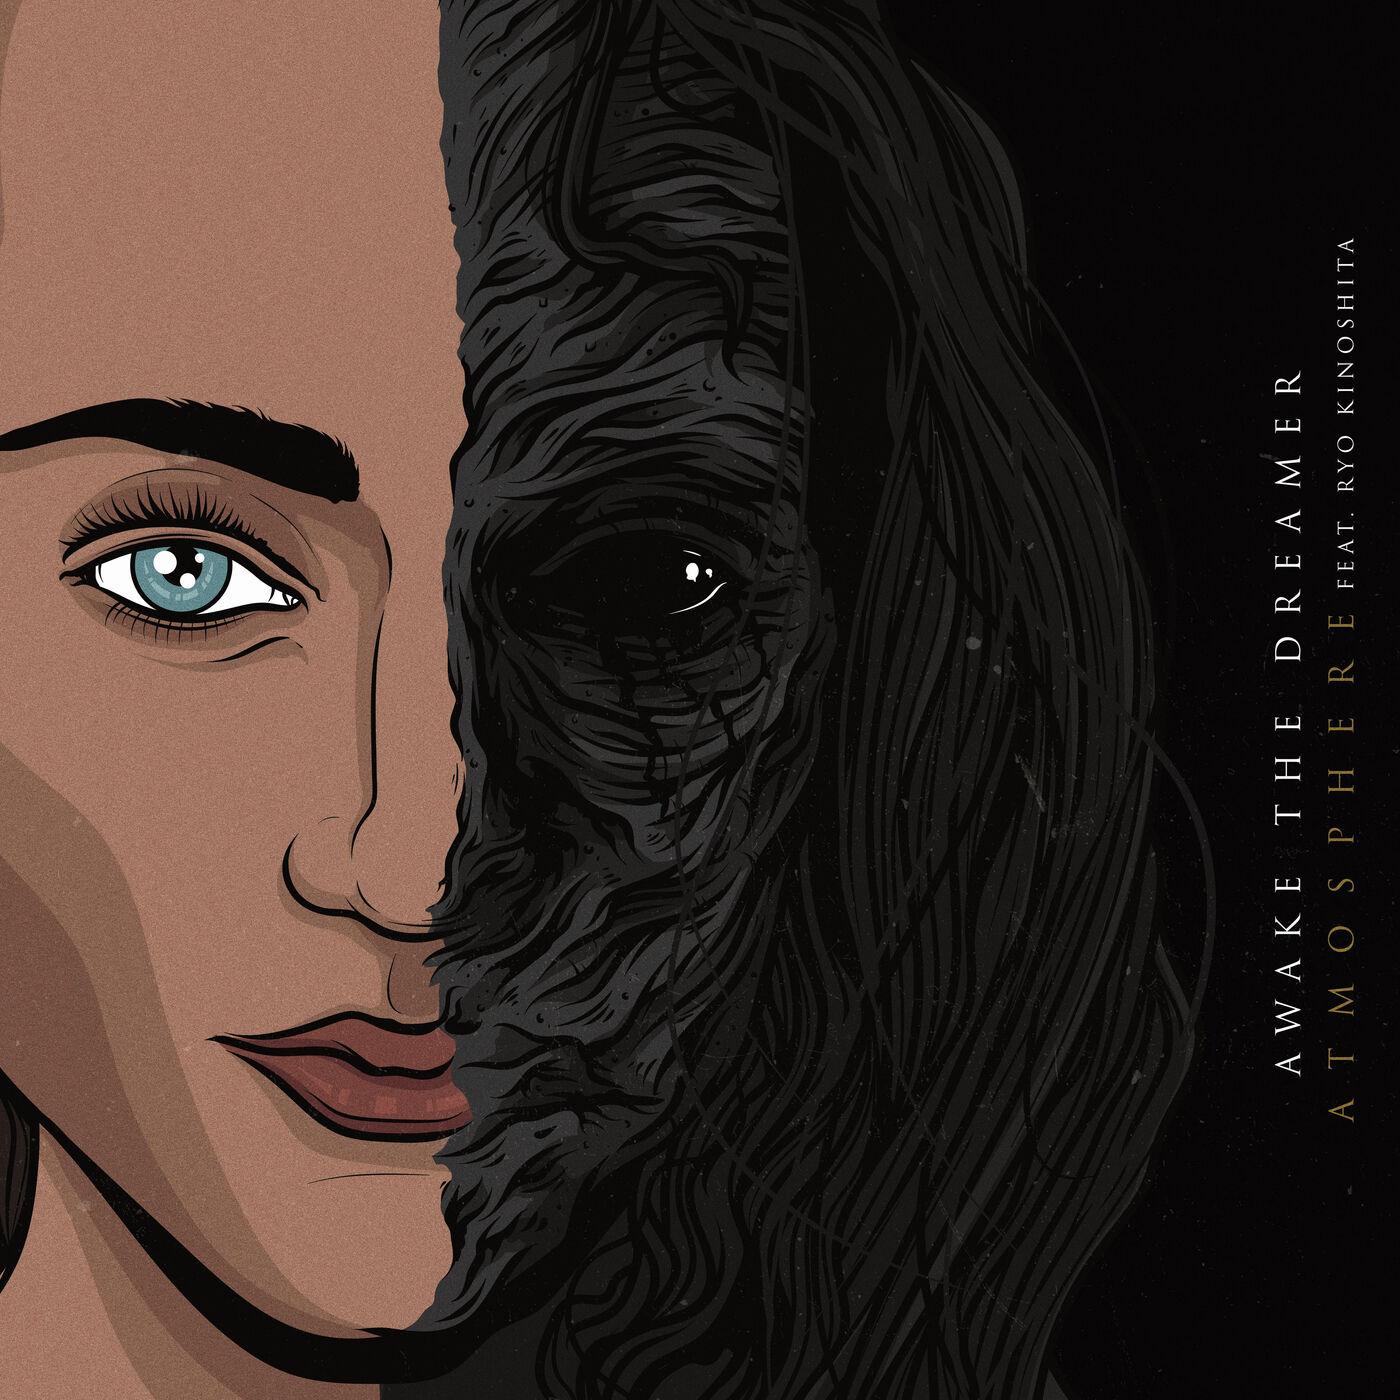 Awake the Dreamer - Atmosphere [single] (2019)